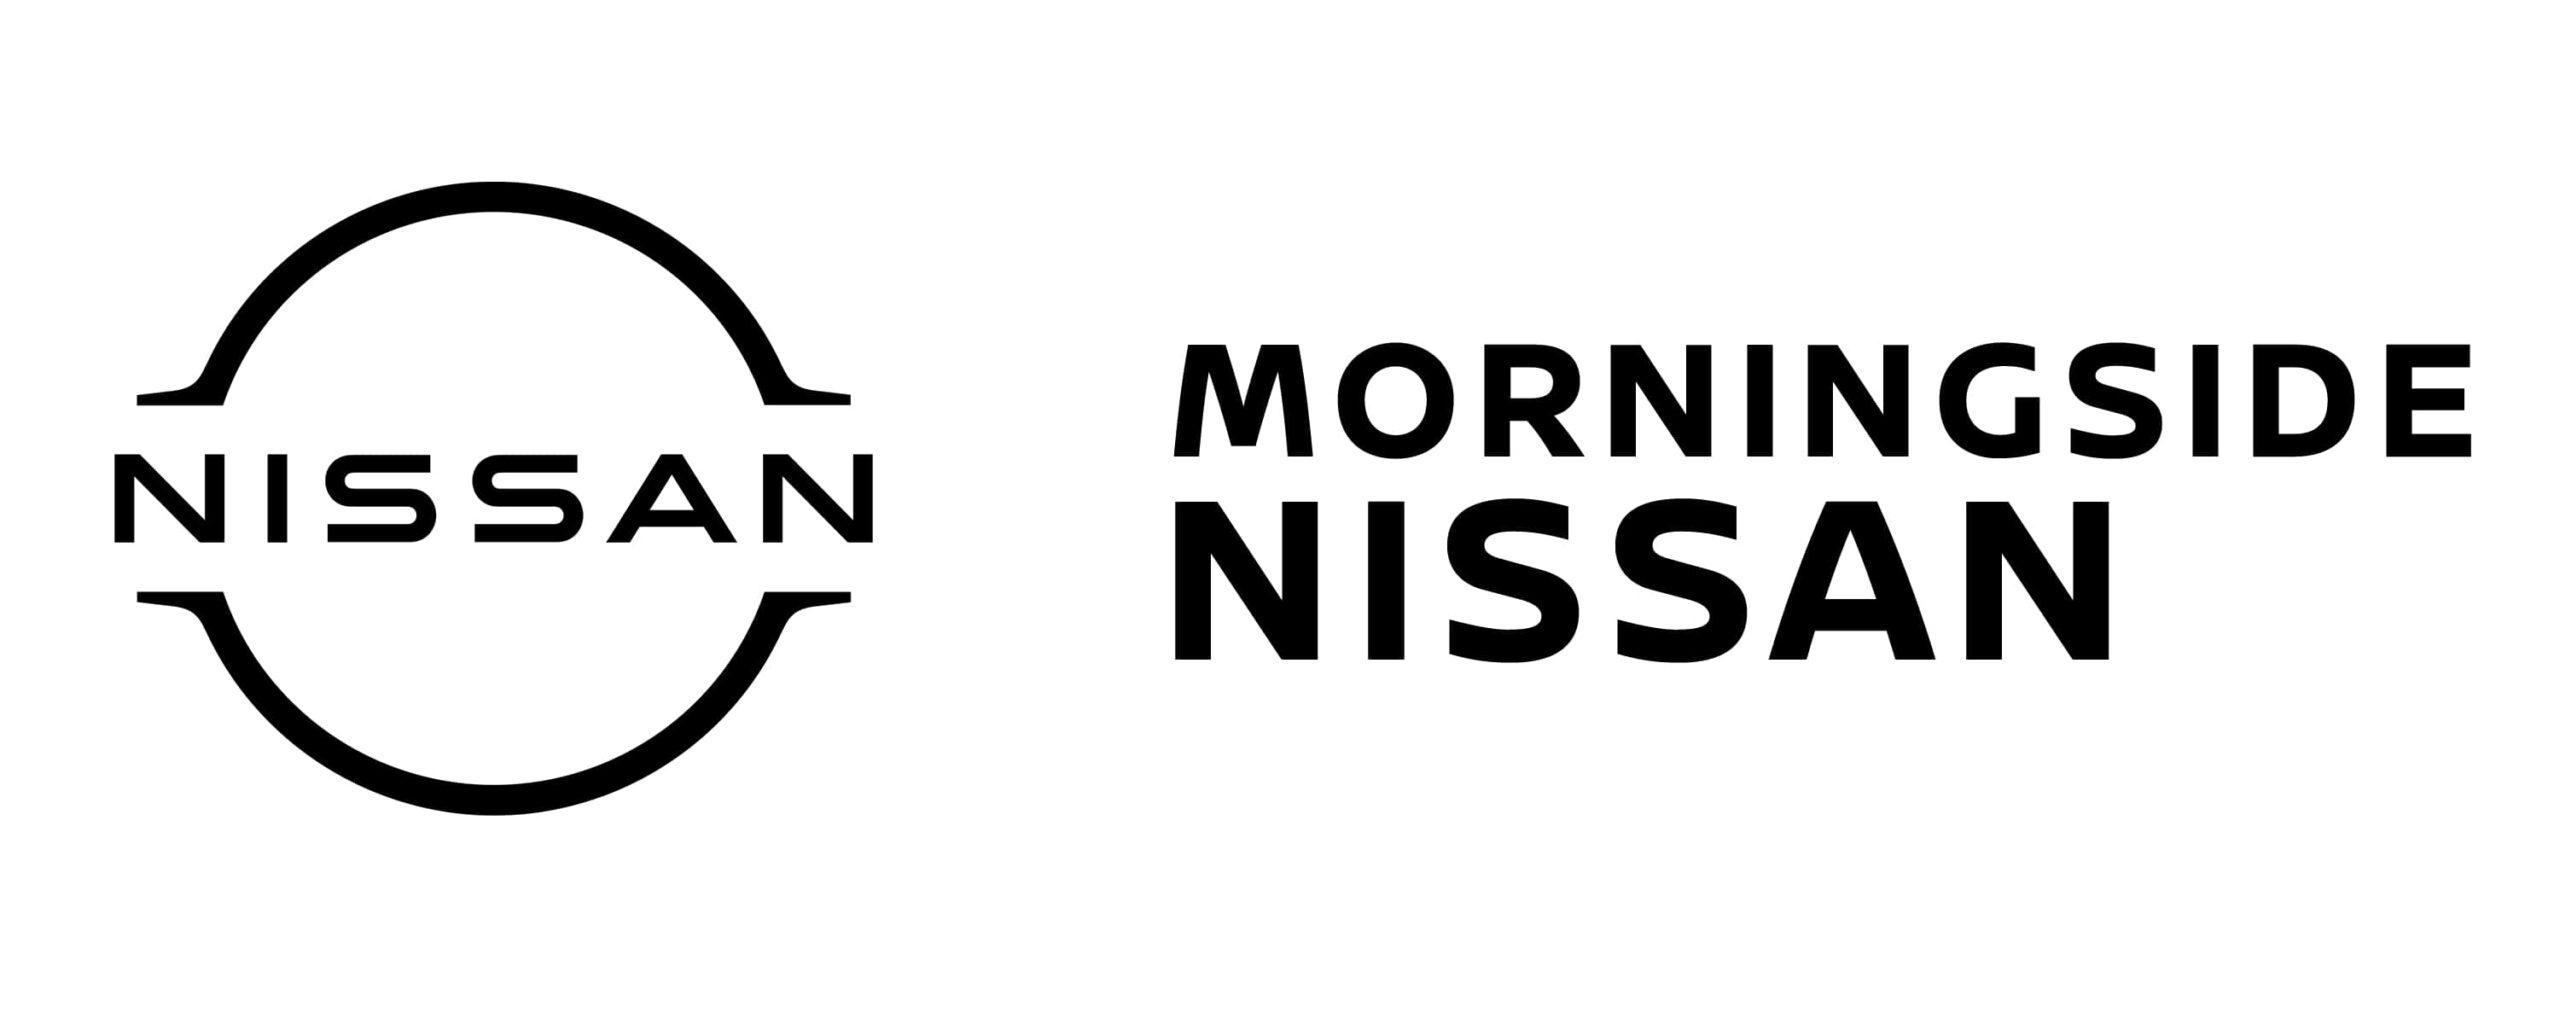 NISSAN MORNINGSIDE NISSAN